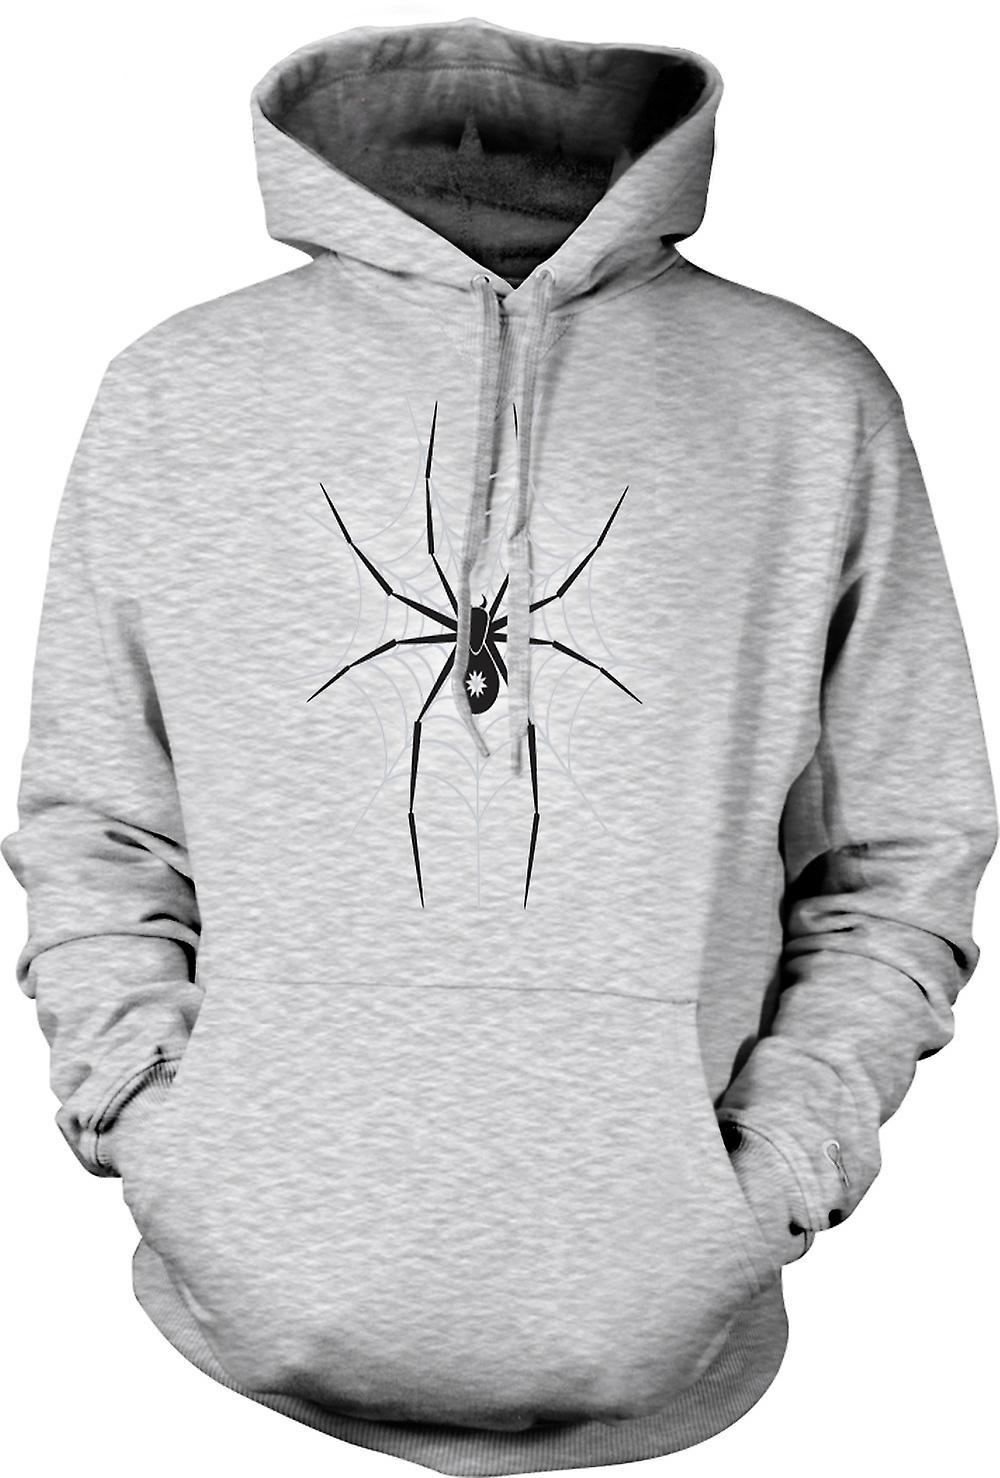 Mens Hoodie - Arachnid amour veuve